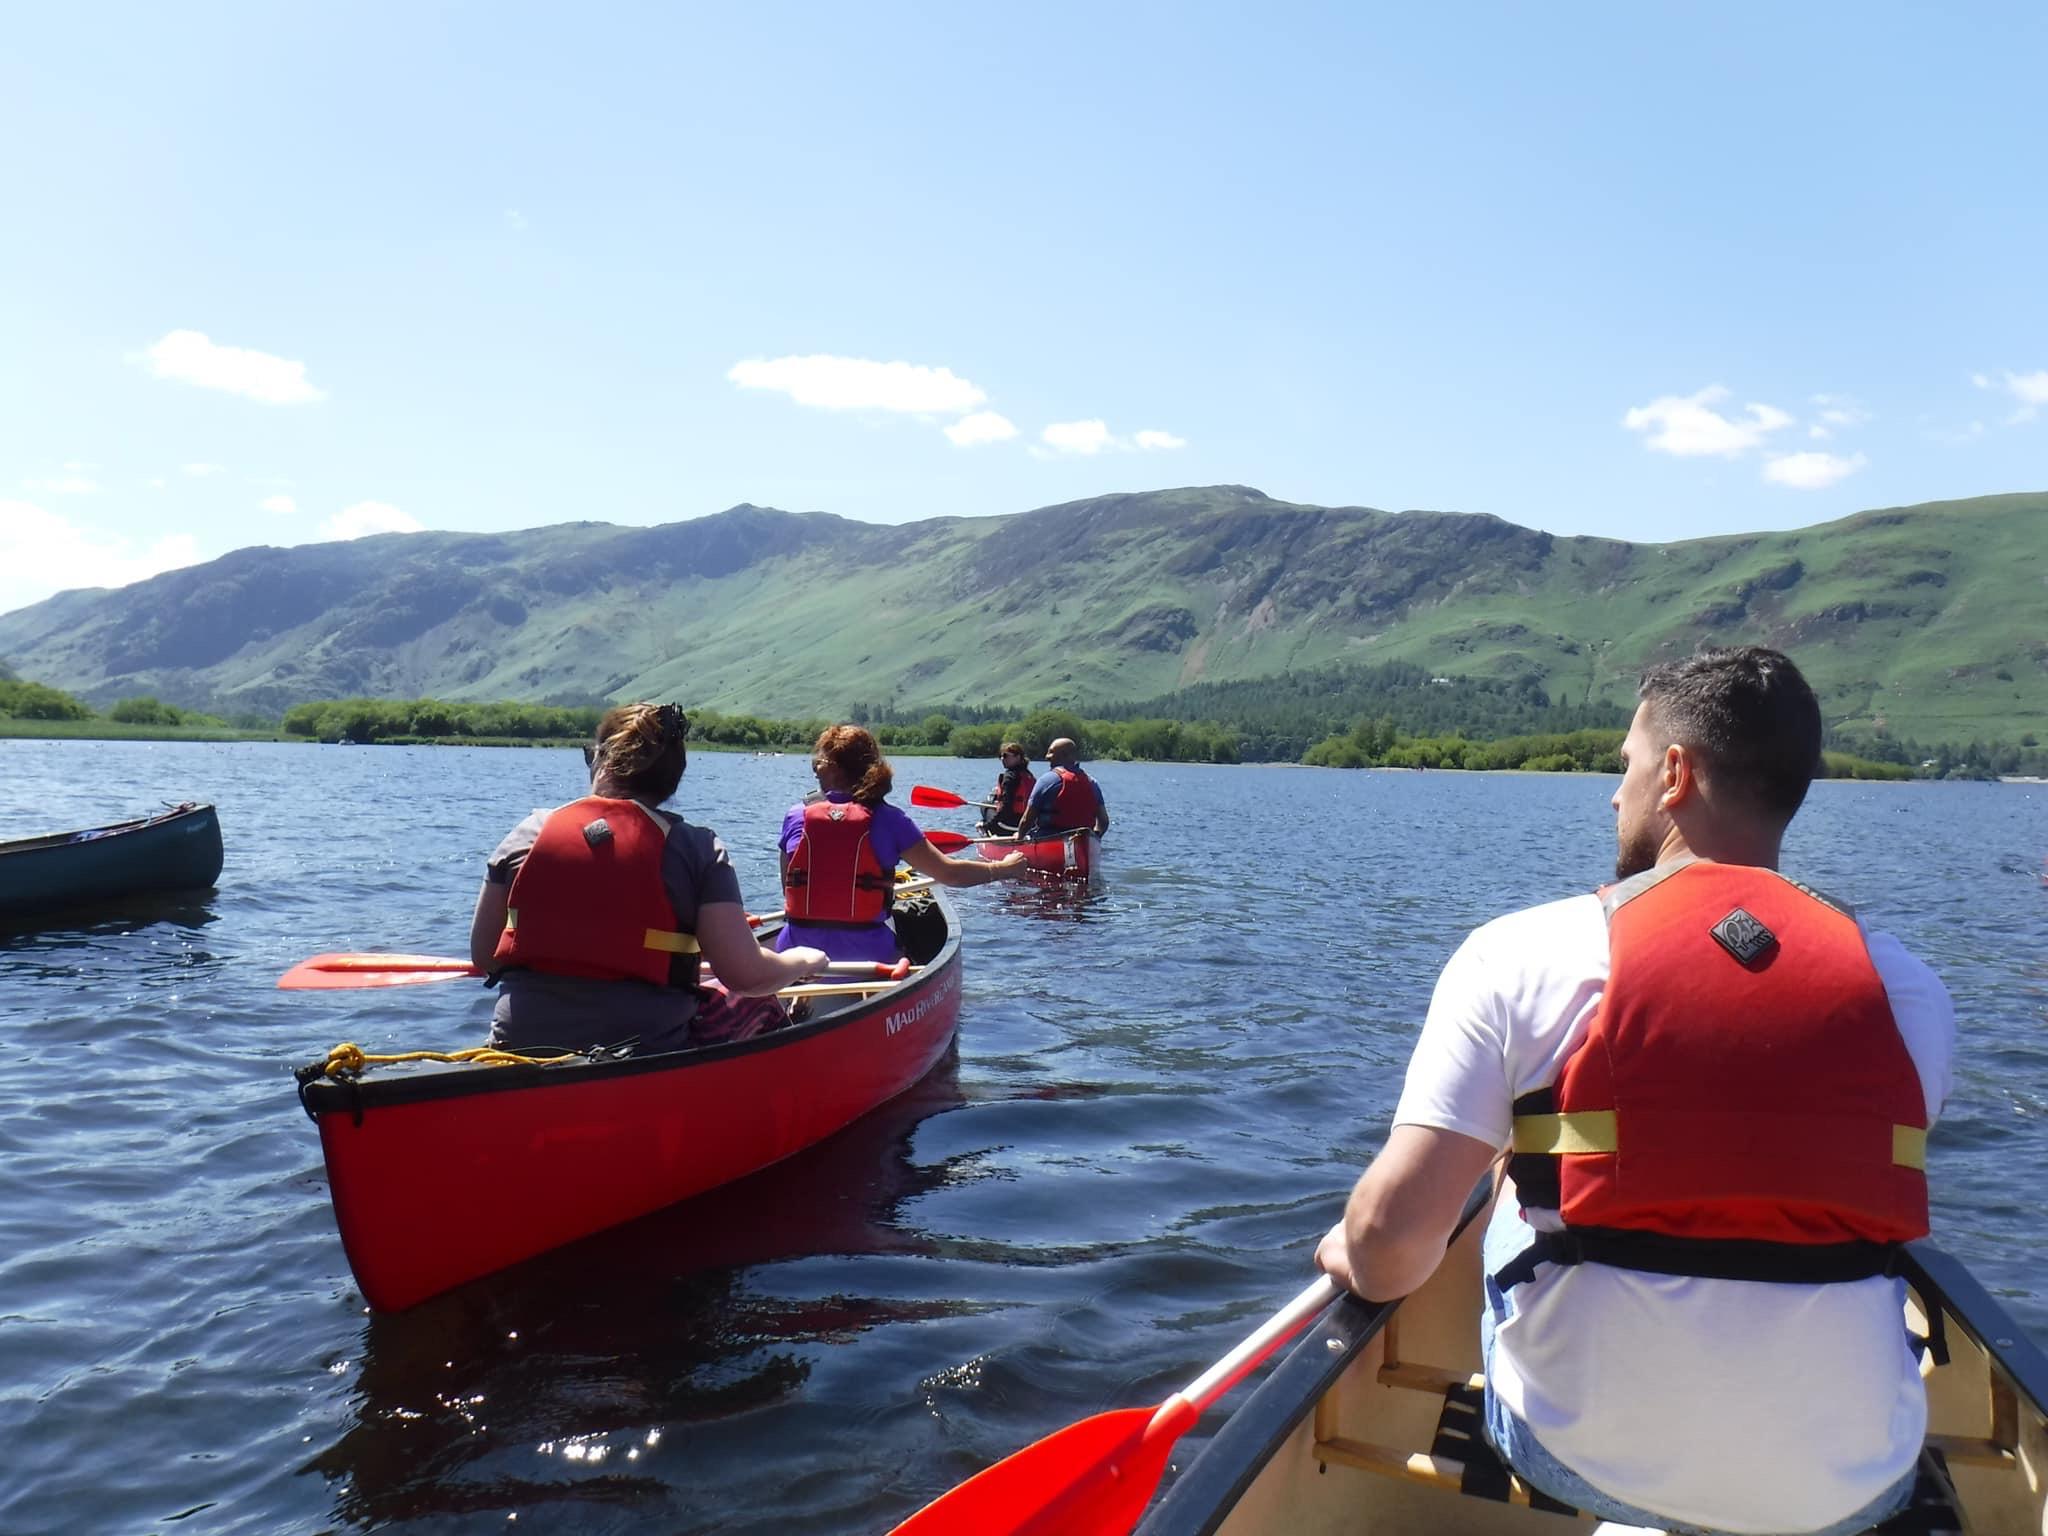 Derwentwater canoeing experience in Keswick: Lake District canoe